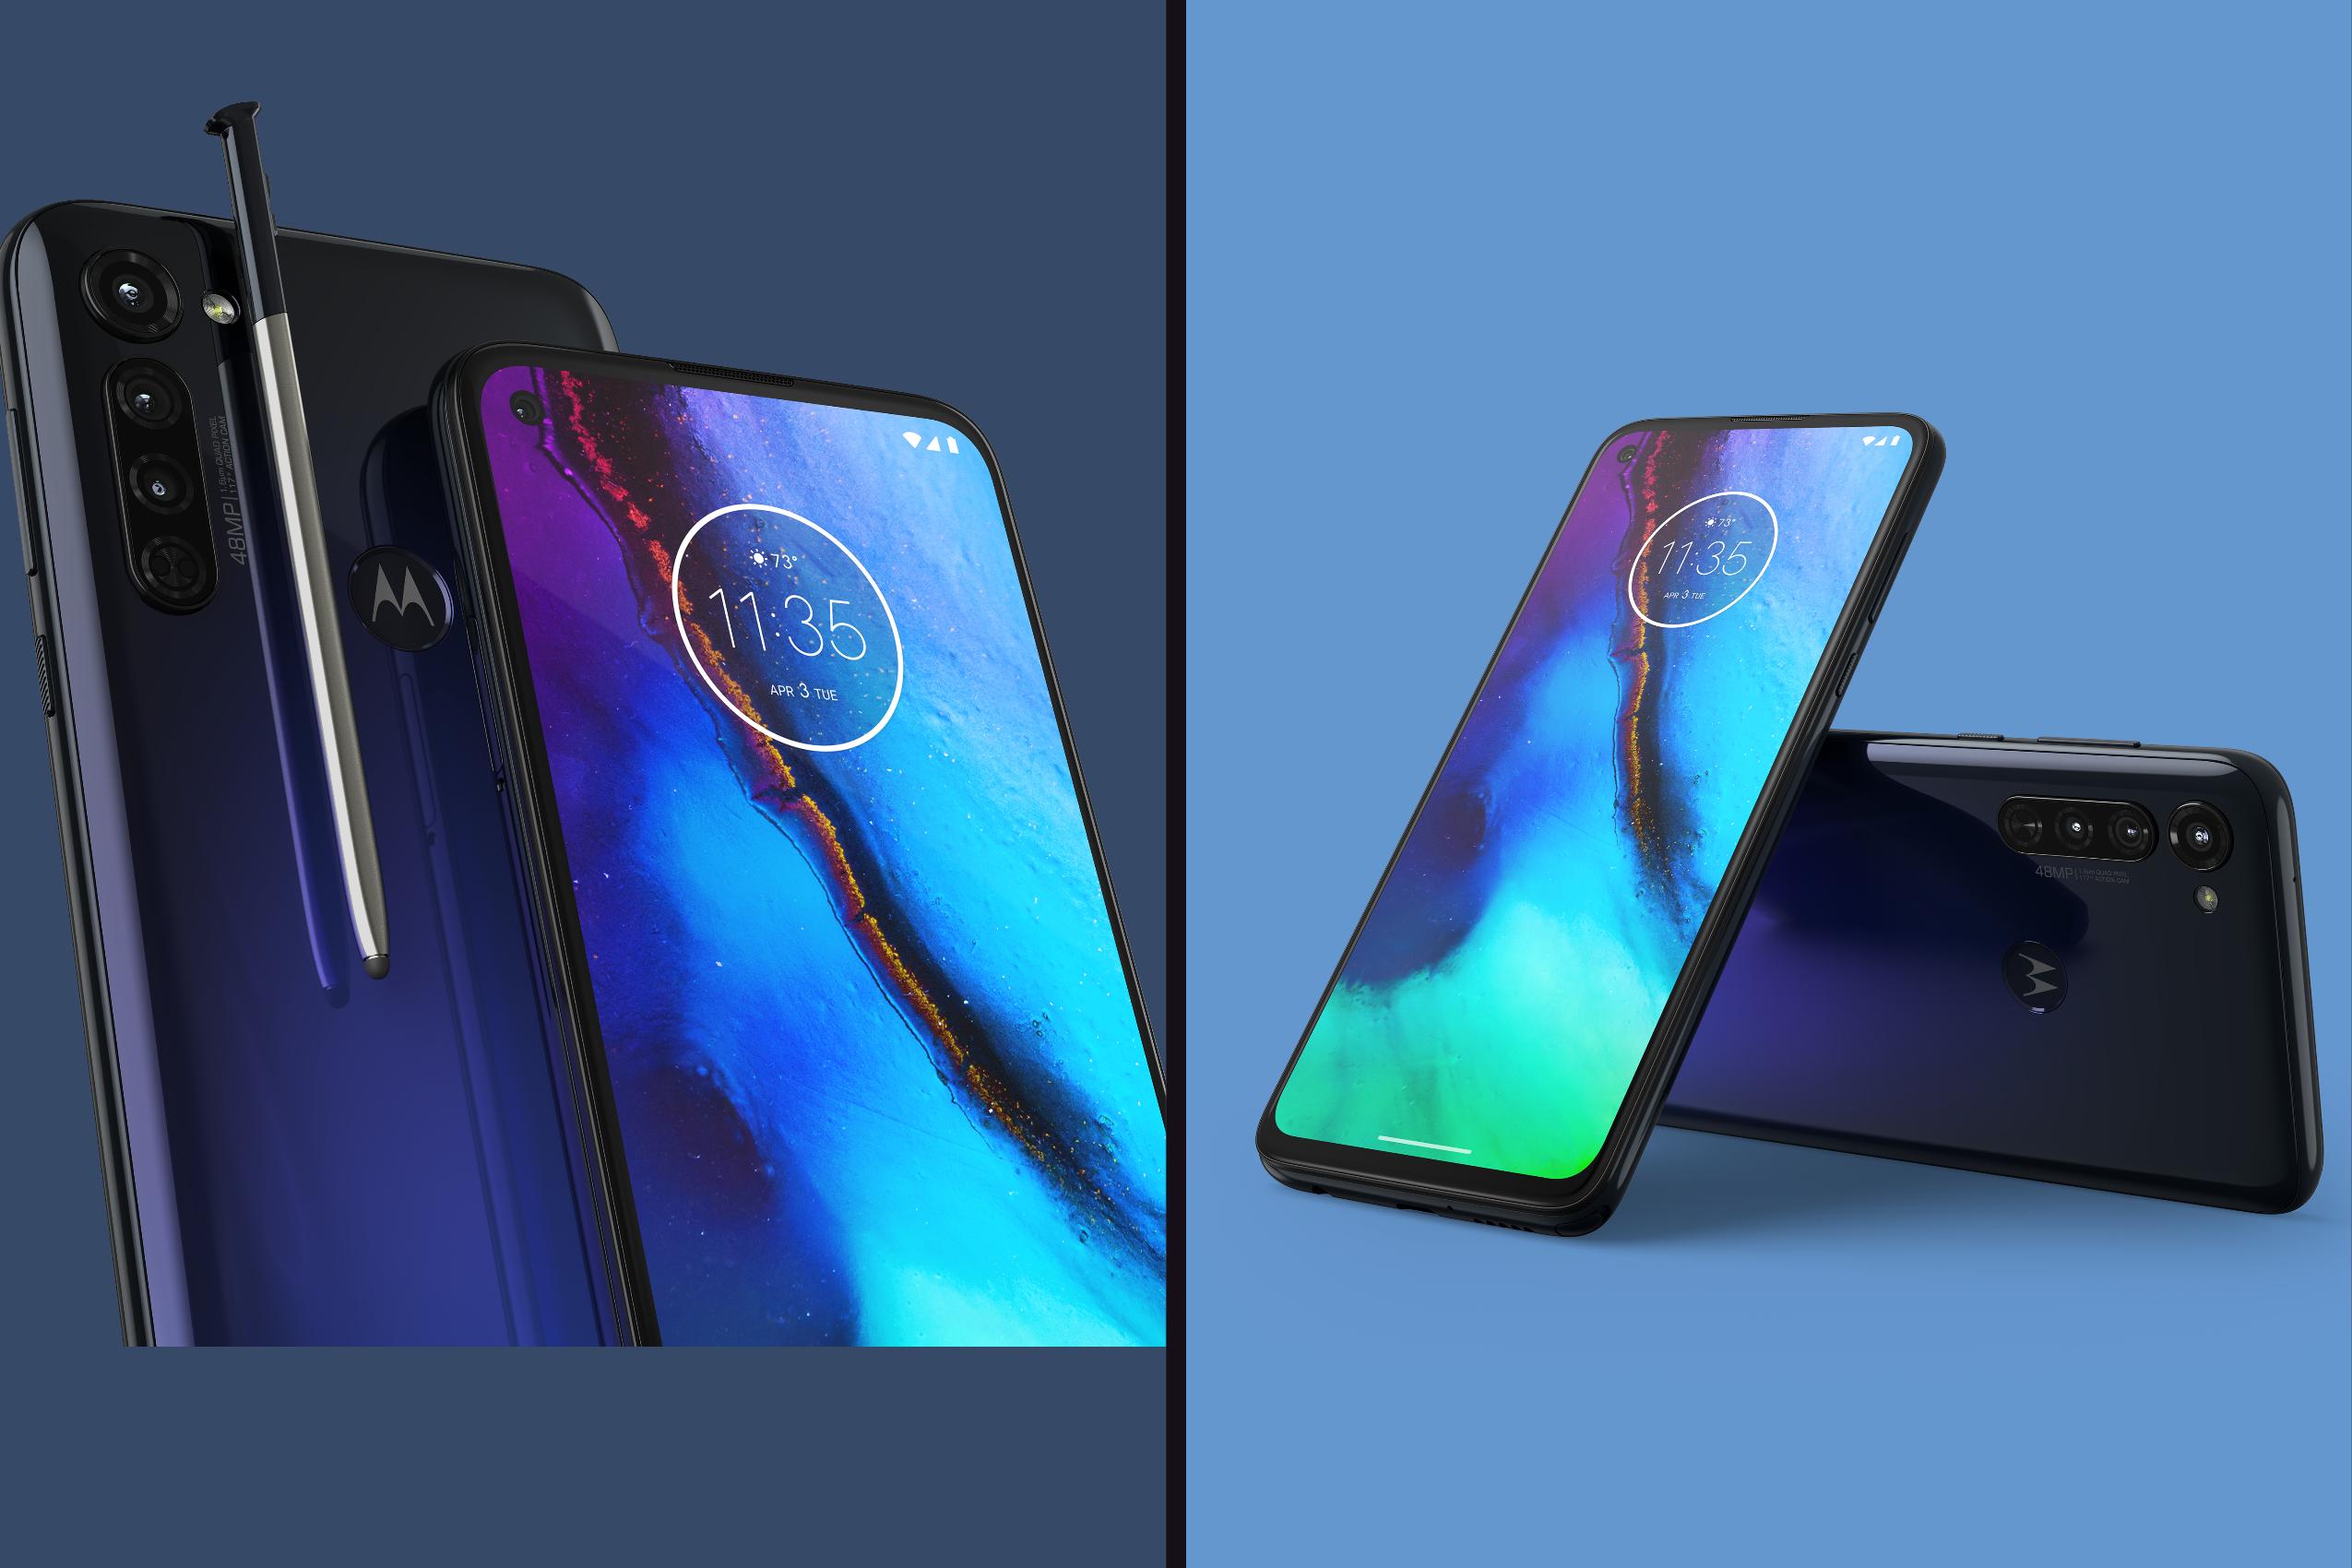 Motorola G Power and Motorola G Stylus